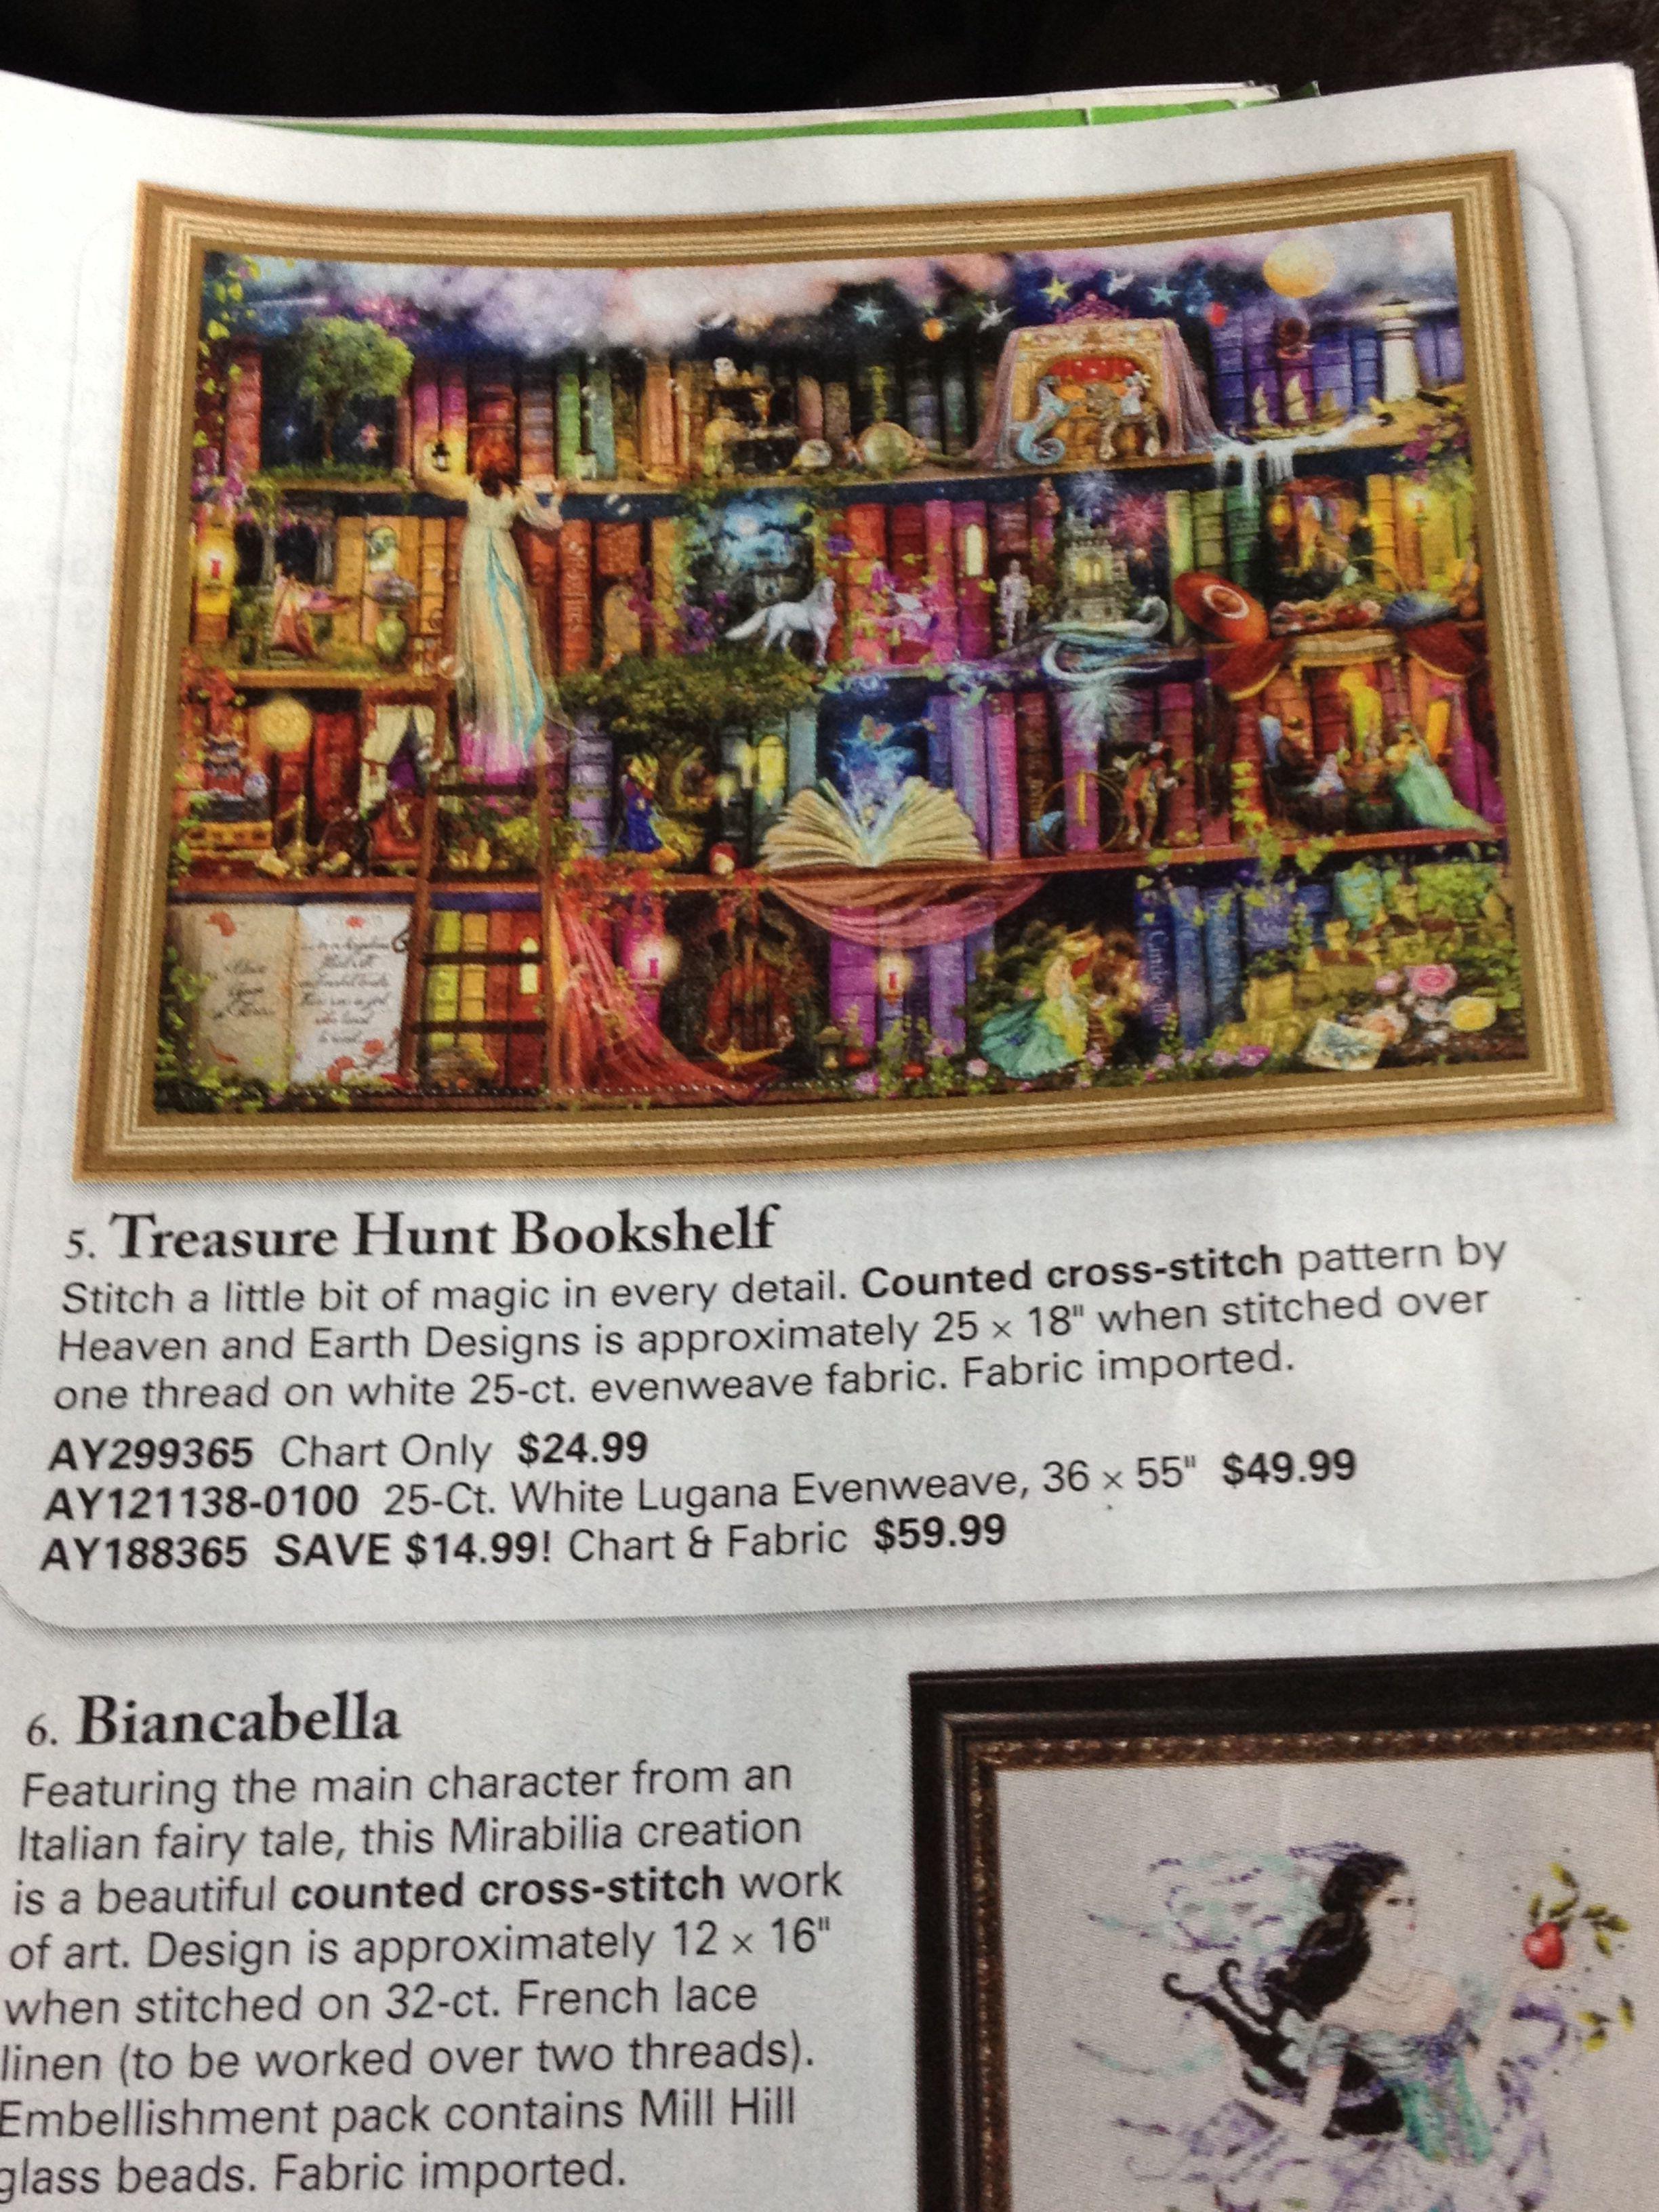 Treasure Hunt Bookshelf By Heaven And Earth Designs